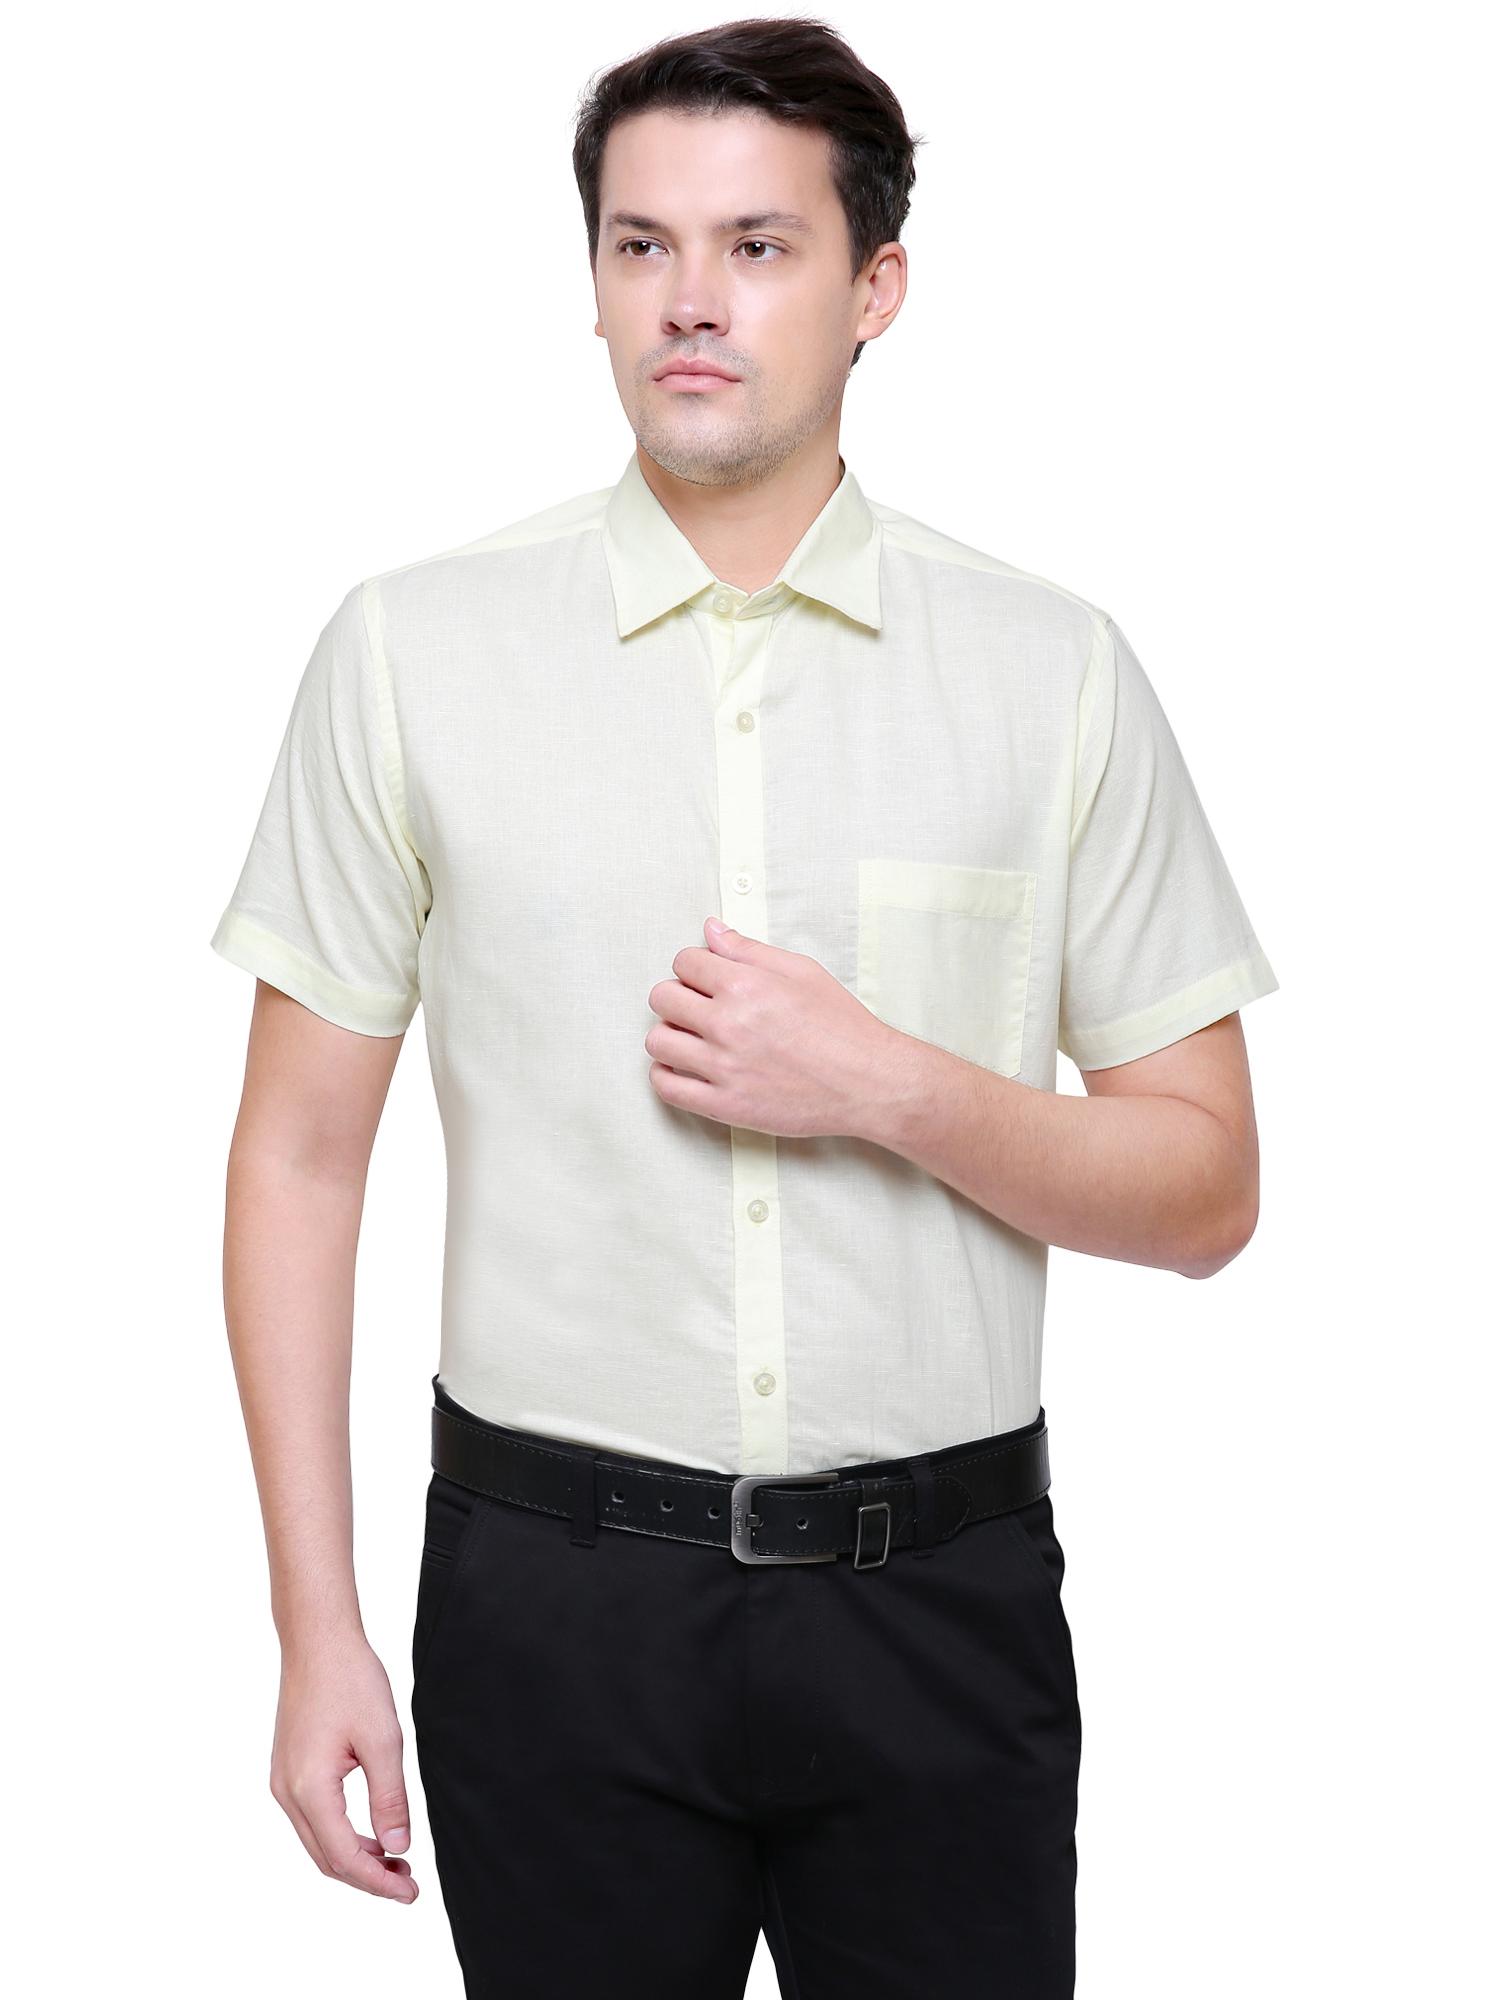 Southbay | Southbay Men's Light Yellow Half Sleeve Linen Cotton Formal Shirt-SBCLHS227YL